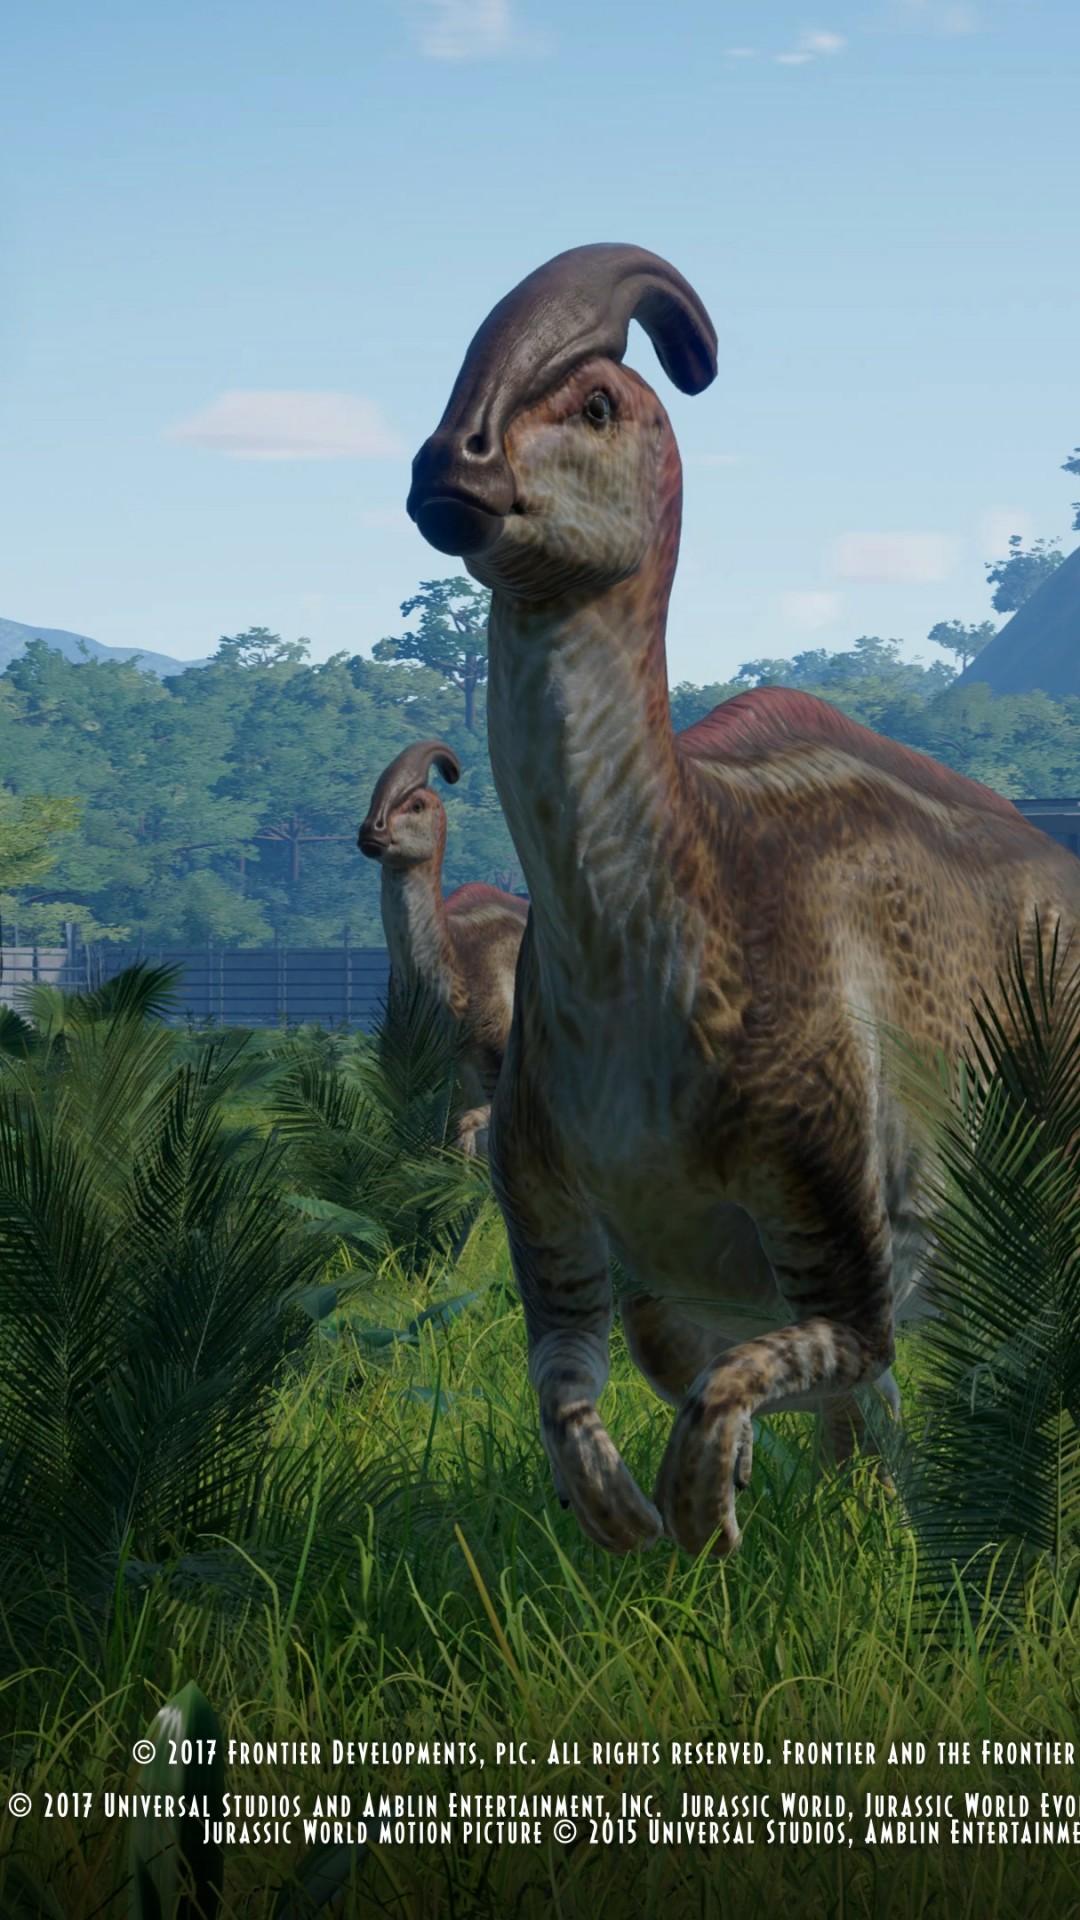 wallpaper jurassic world evolution screenshot 4k games